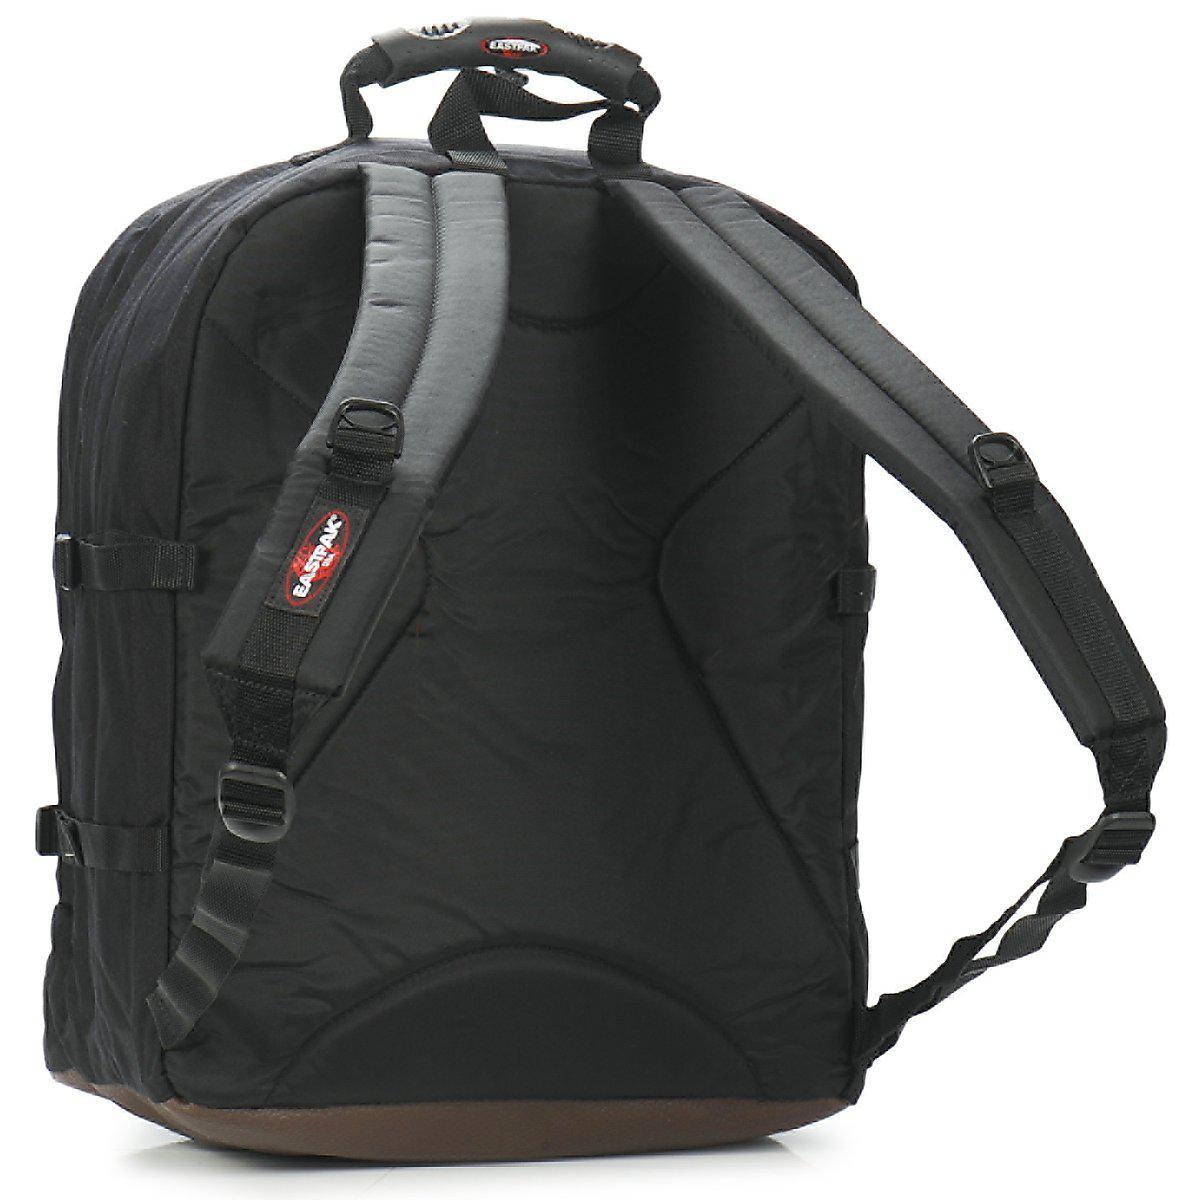 Eastpak Ultimate Women's Backpack In Black